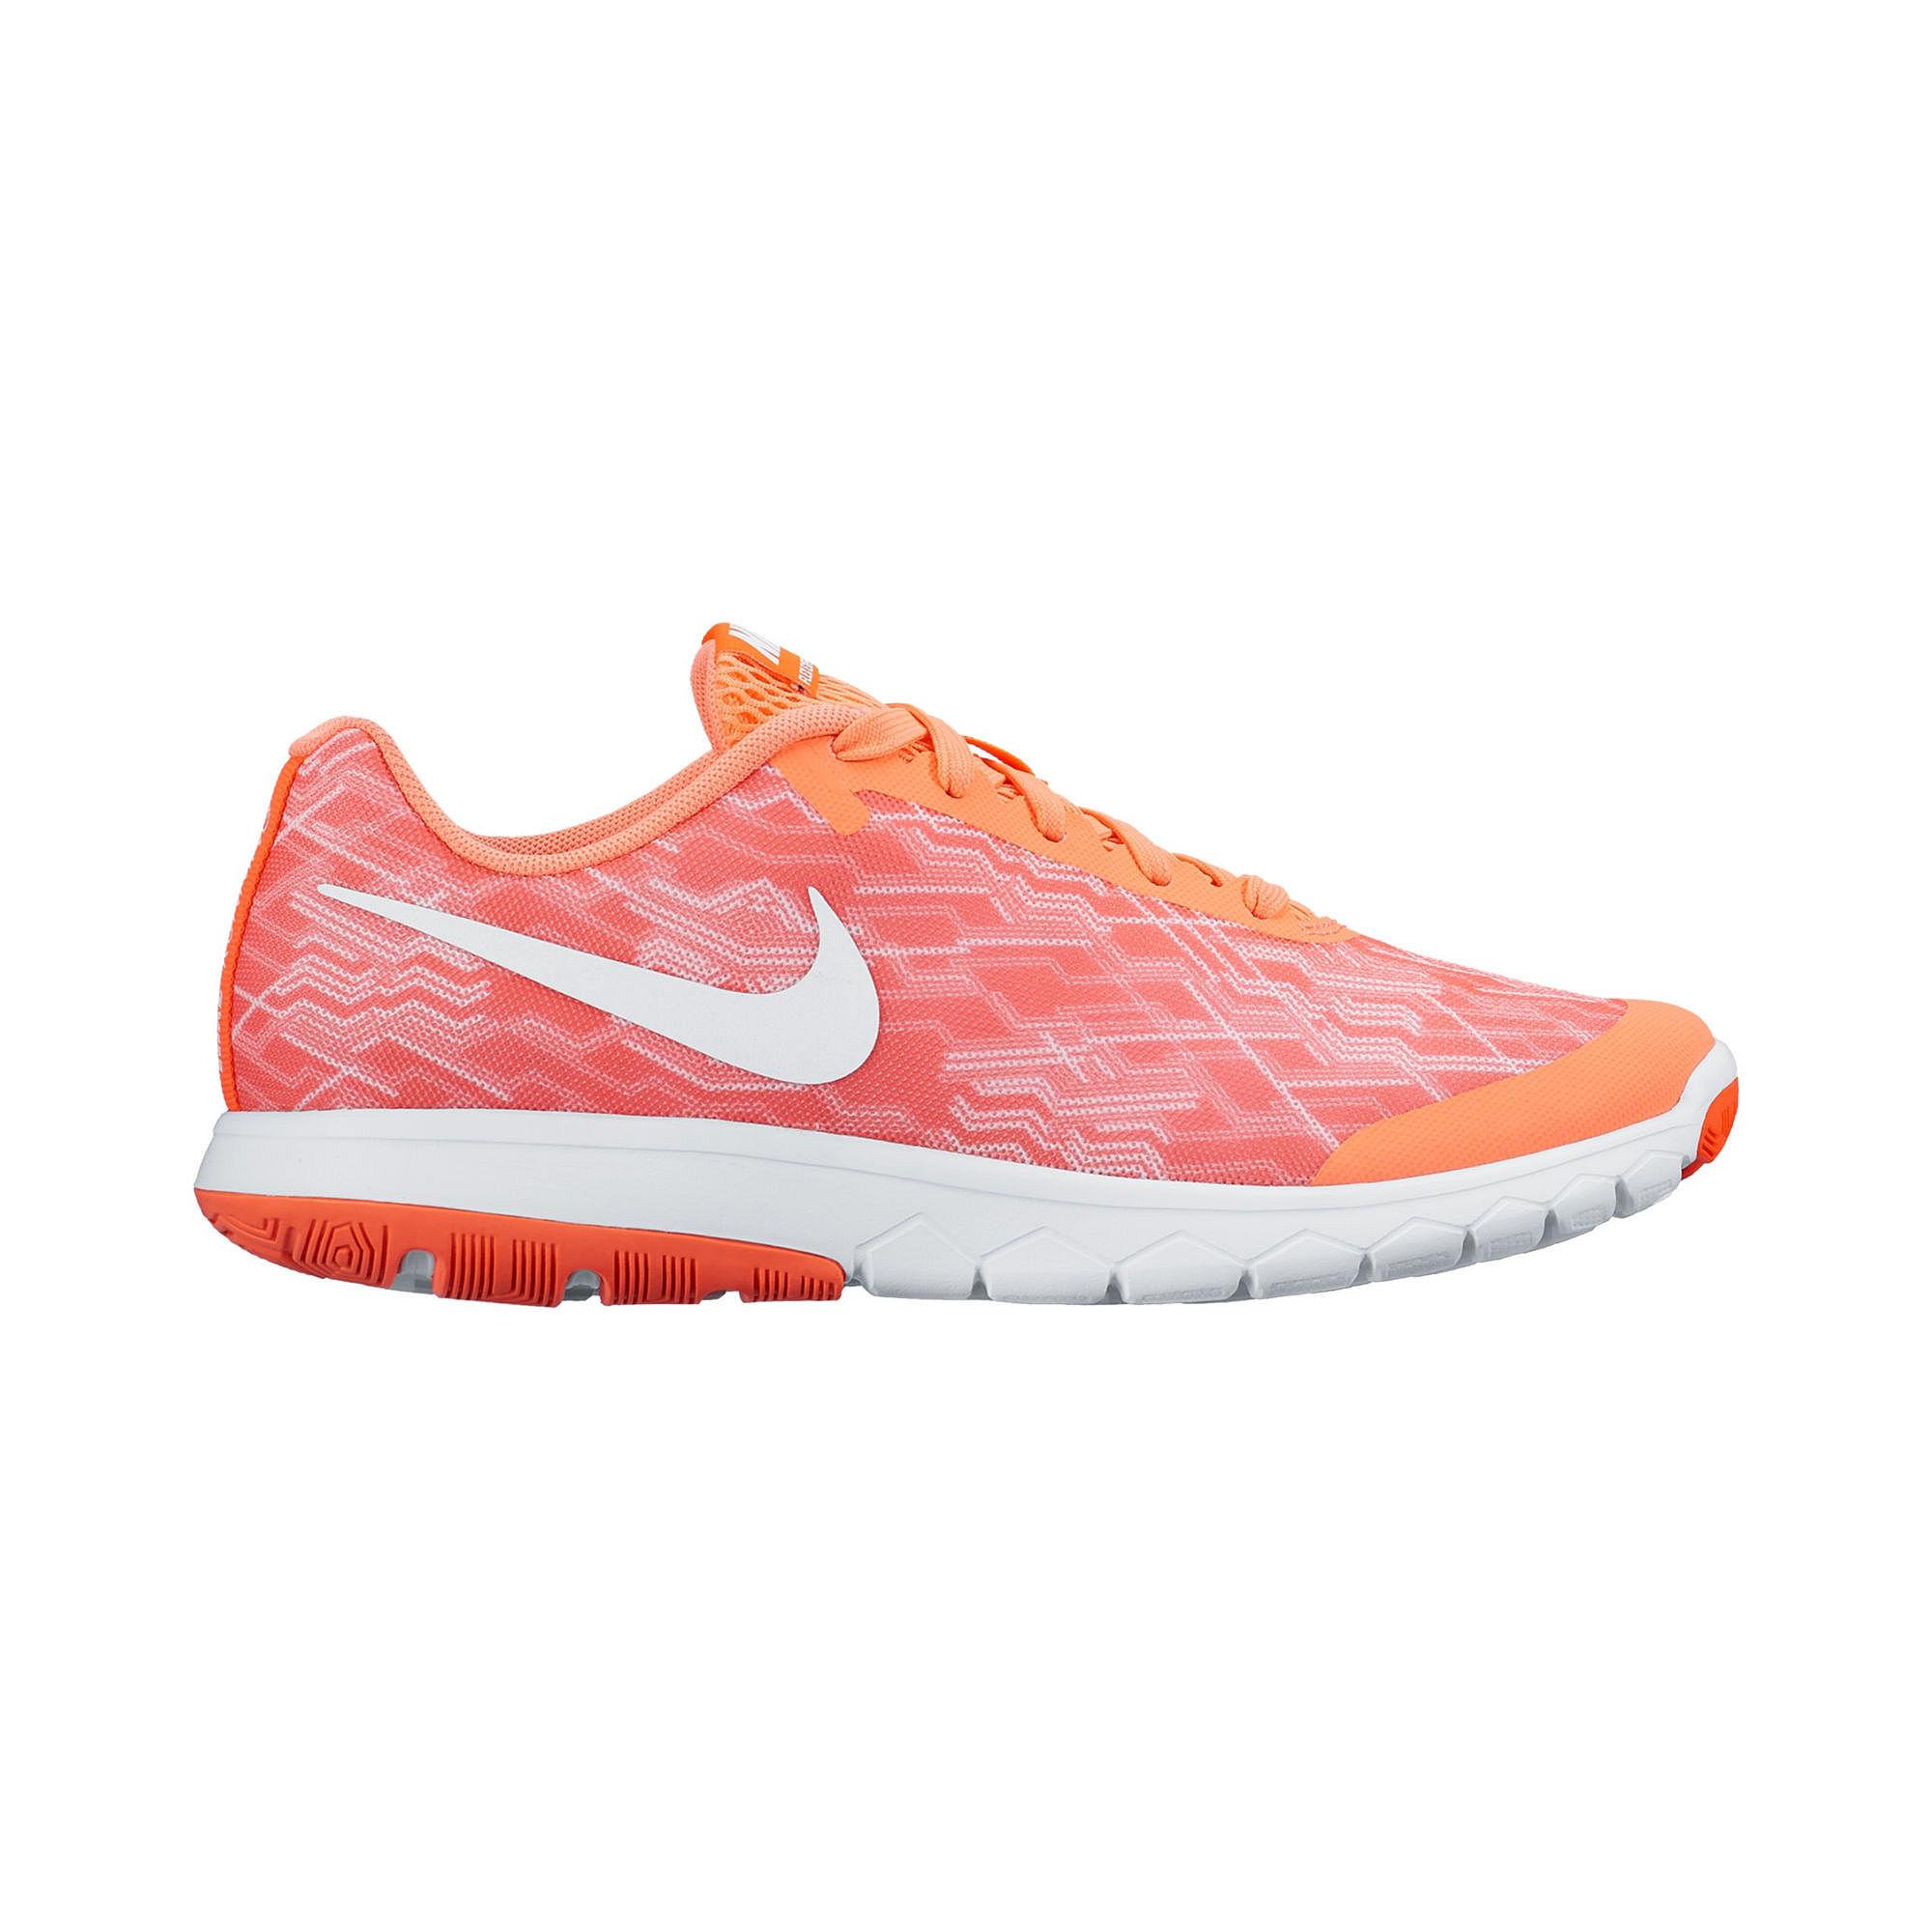 Nike Women's Orange Flex Experience RN5 Premium Running Shoes 844673-800 Sz 6.5